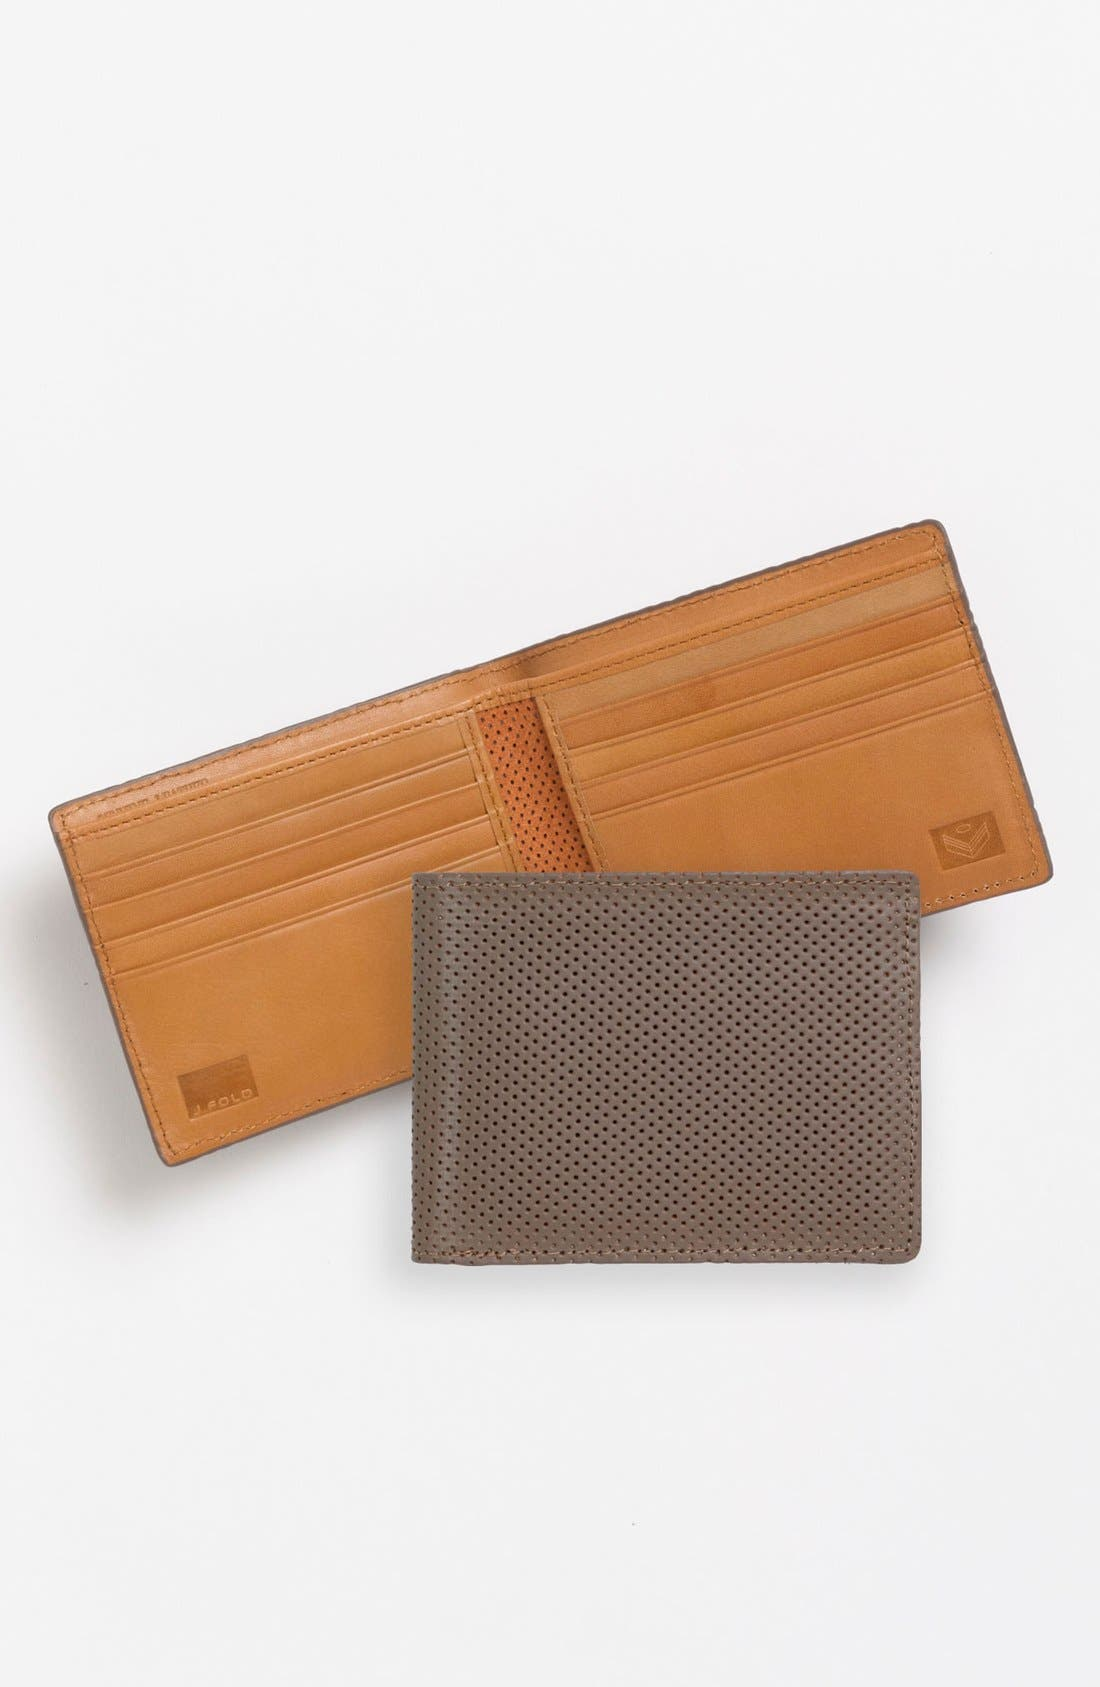 Main Image - J Fold 'Microperf' Slimfold Wallet